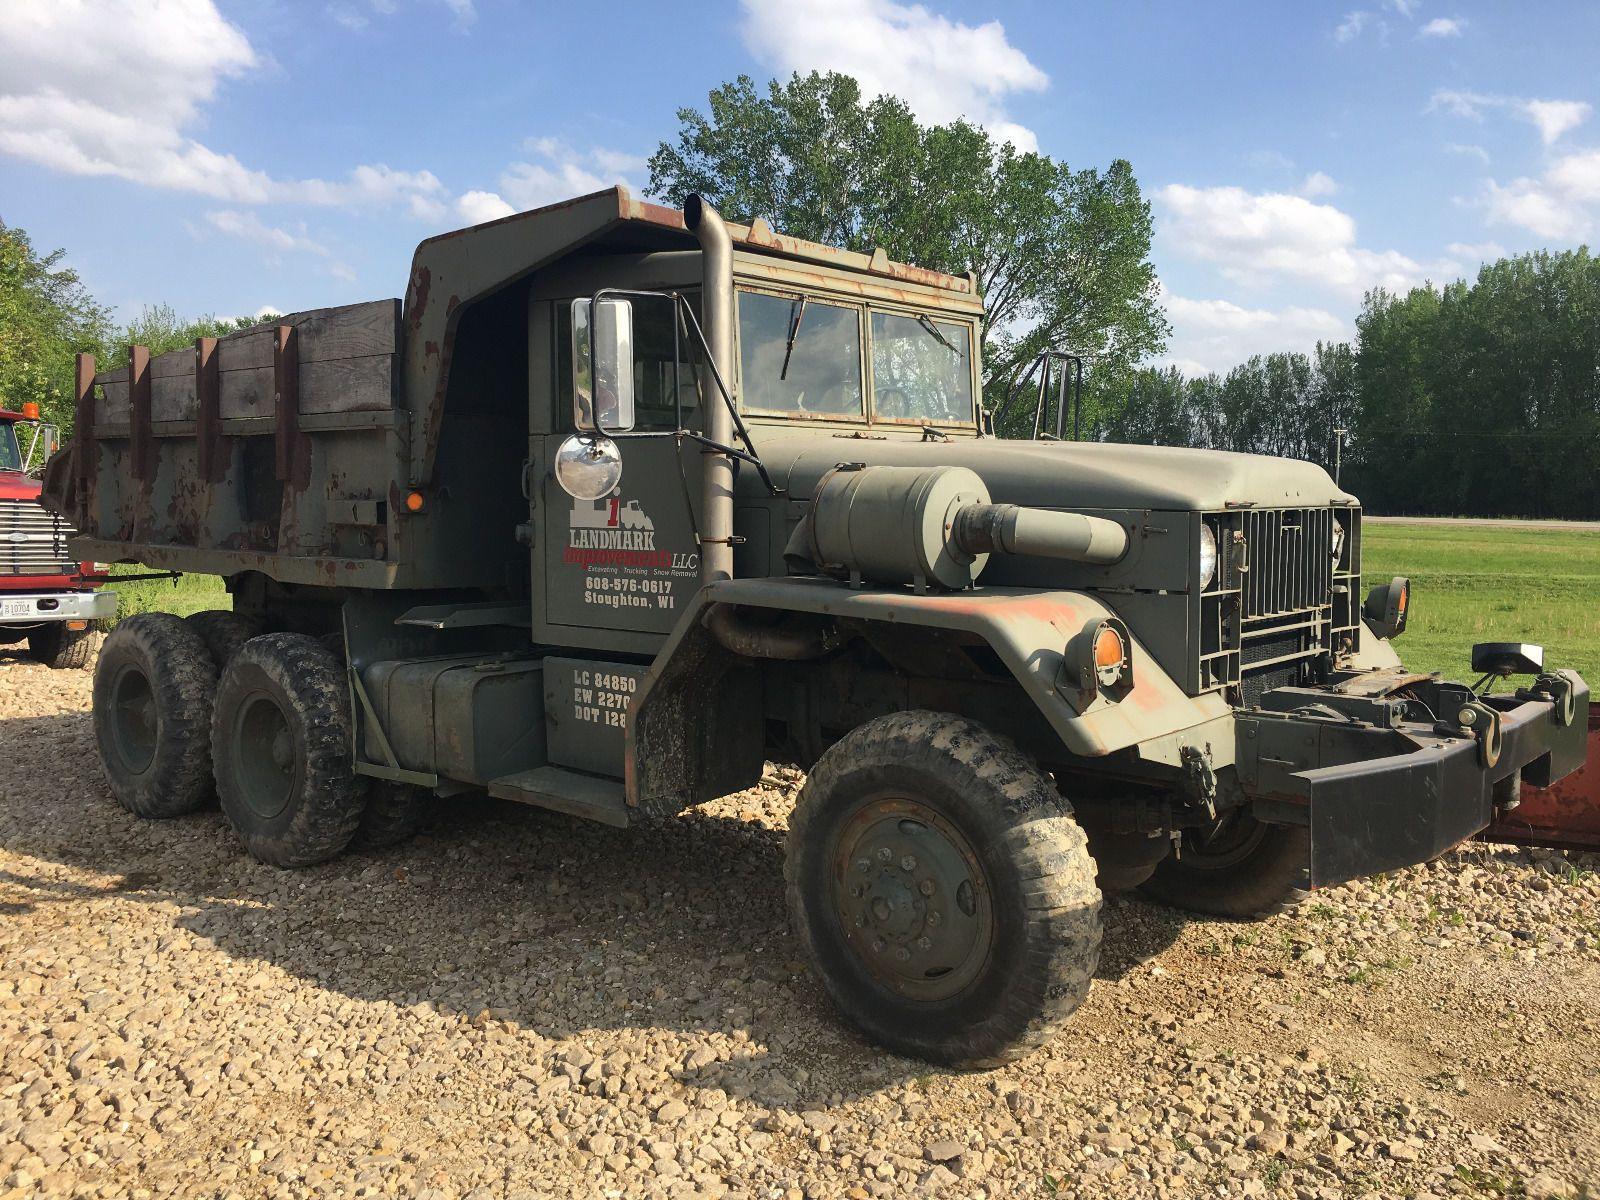 dump truck 1967 jeep kaiser military M51a2 for sale